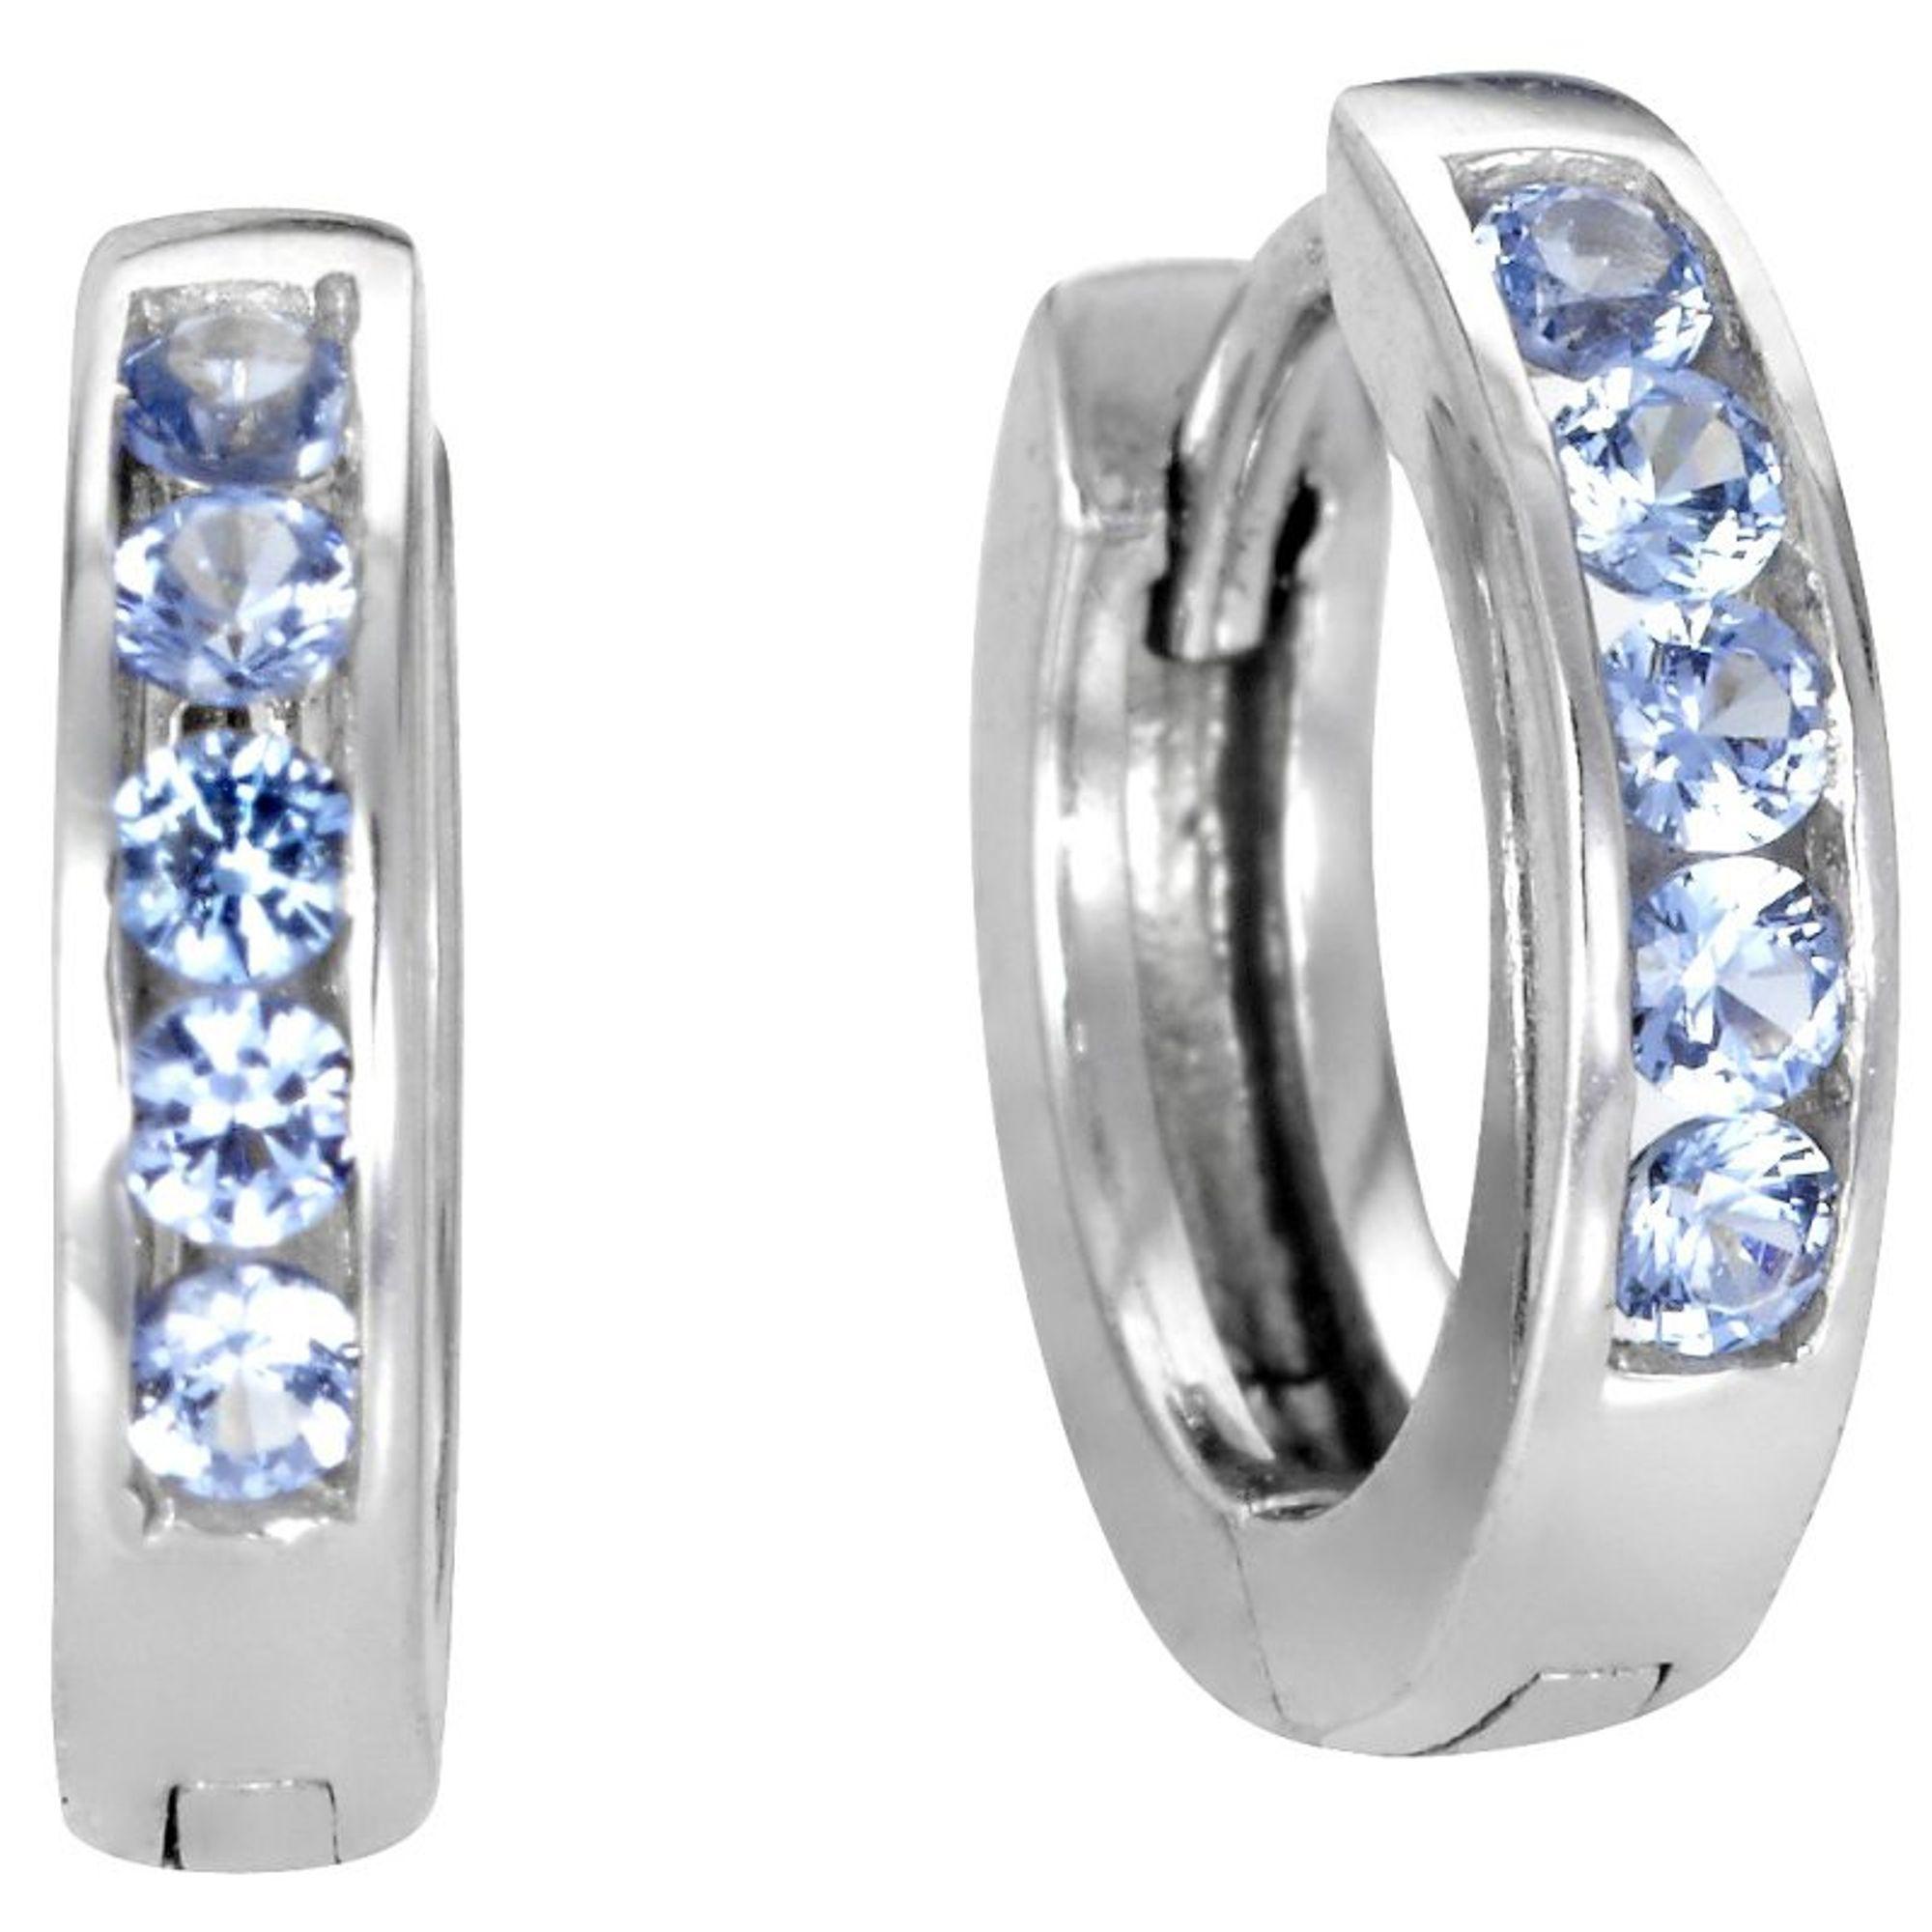 Basic Silber Damen SCR03 Creolen Silber Zirkonia Blau